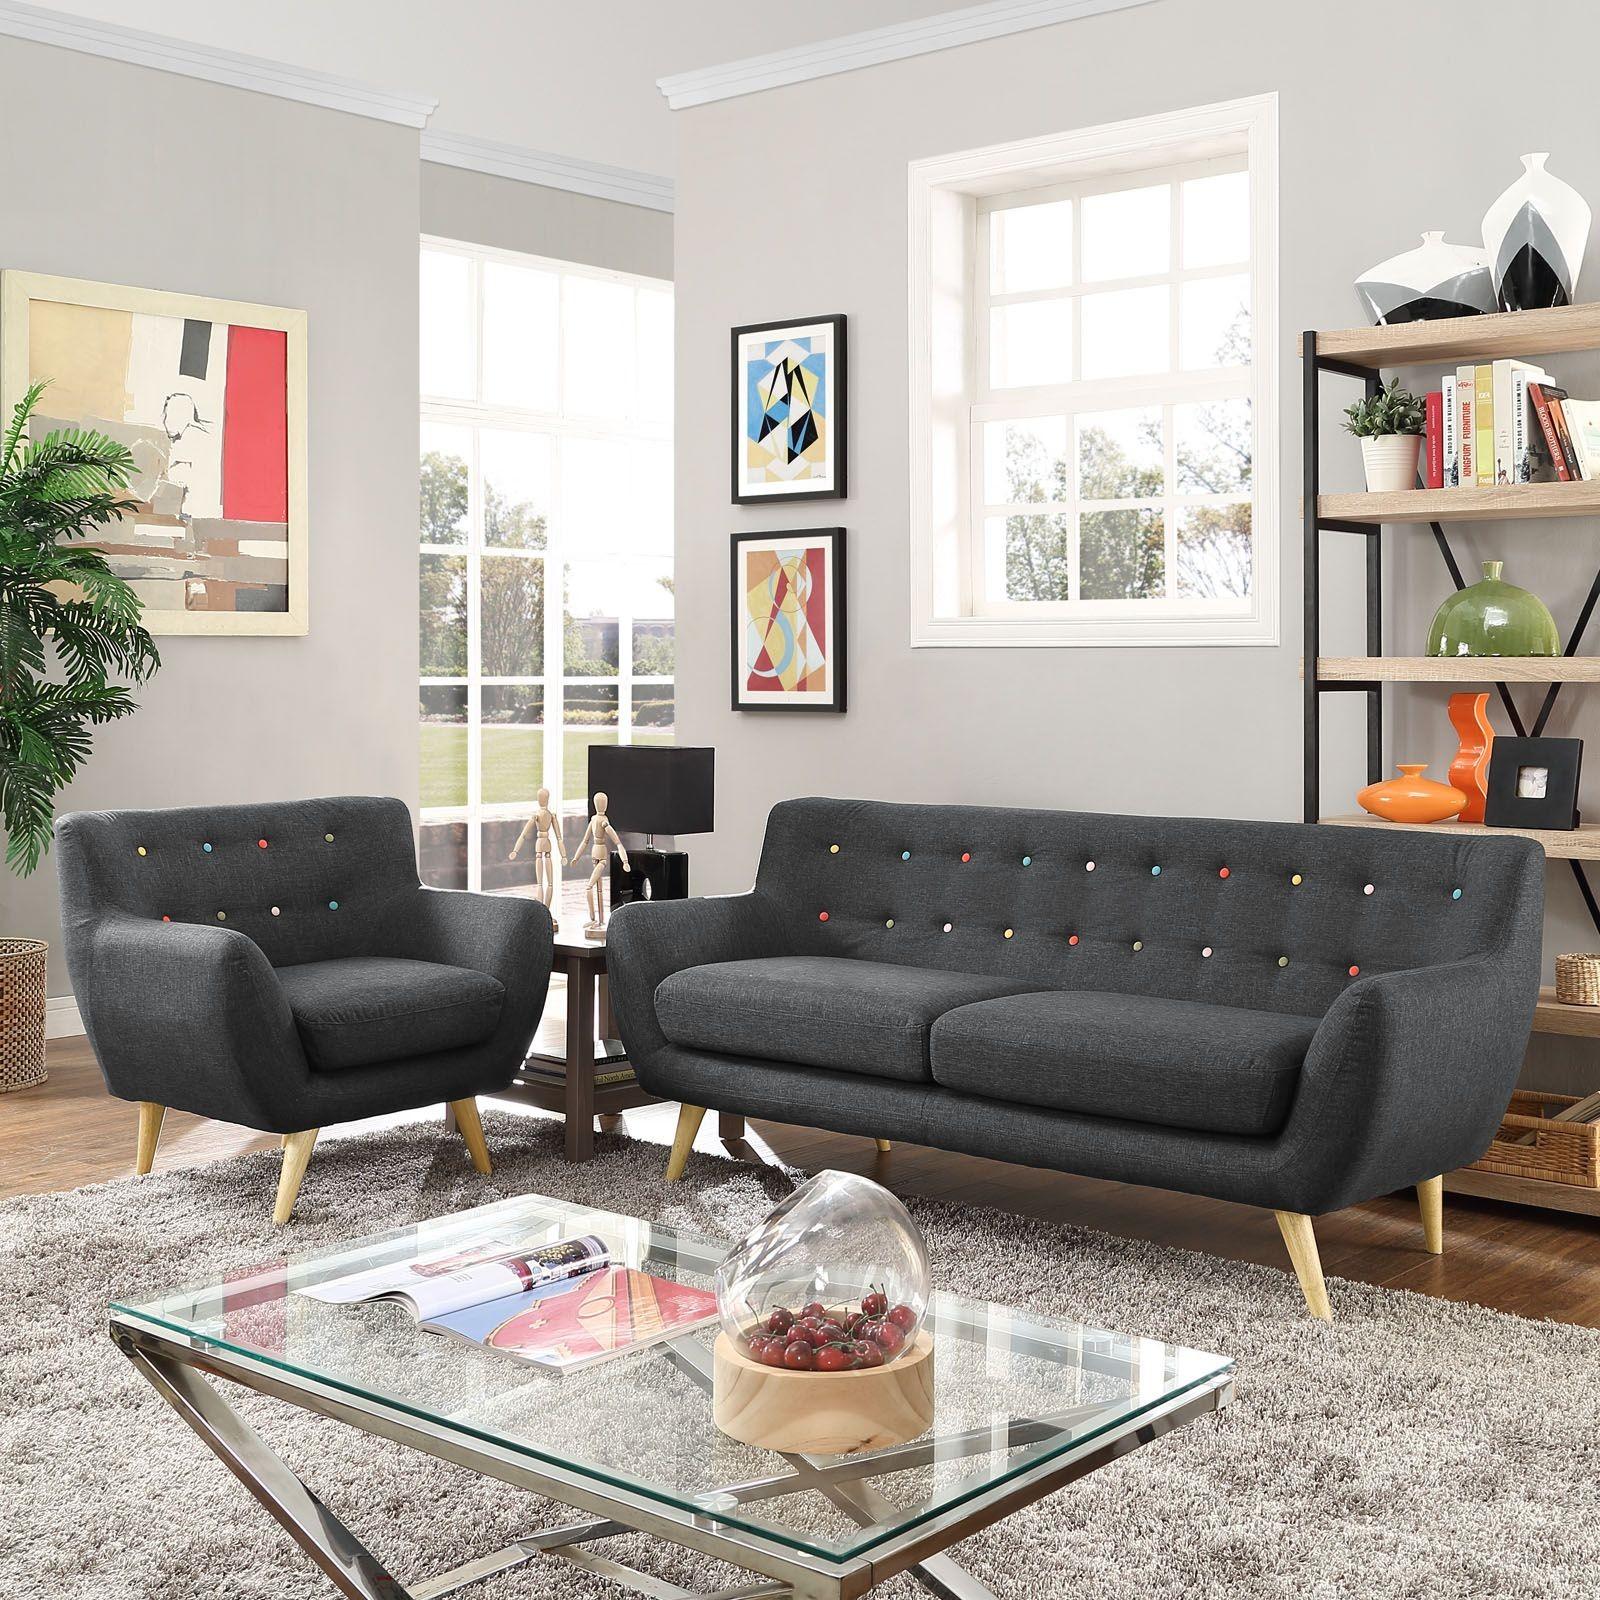 sitting sofa designs kidney set remark upholstered in gray shop for affordable home